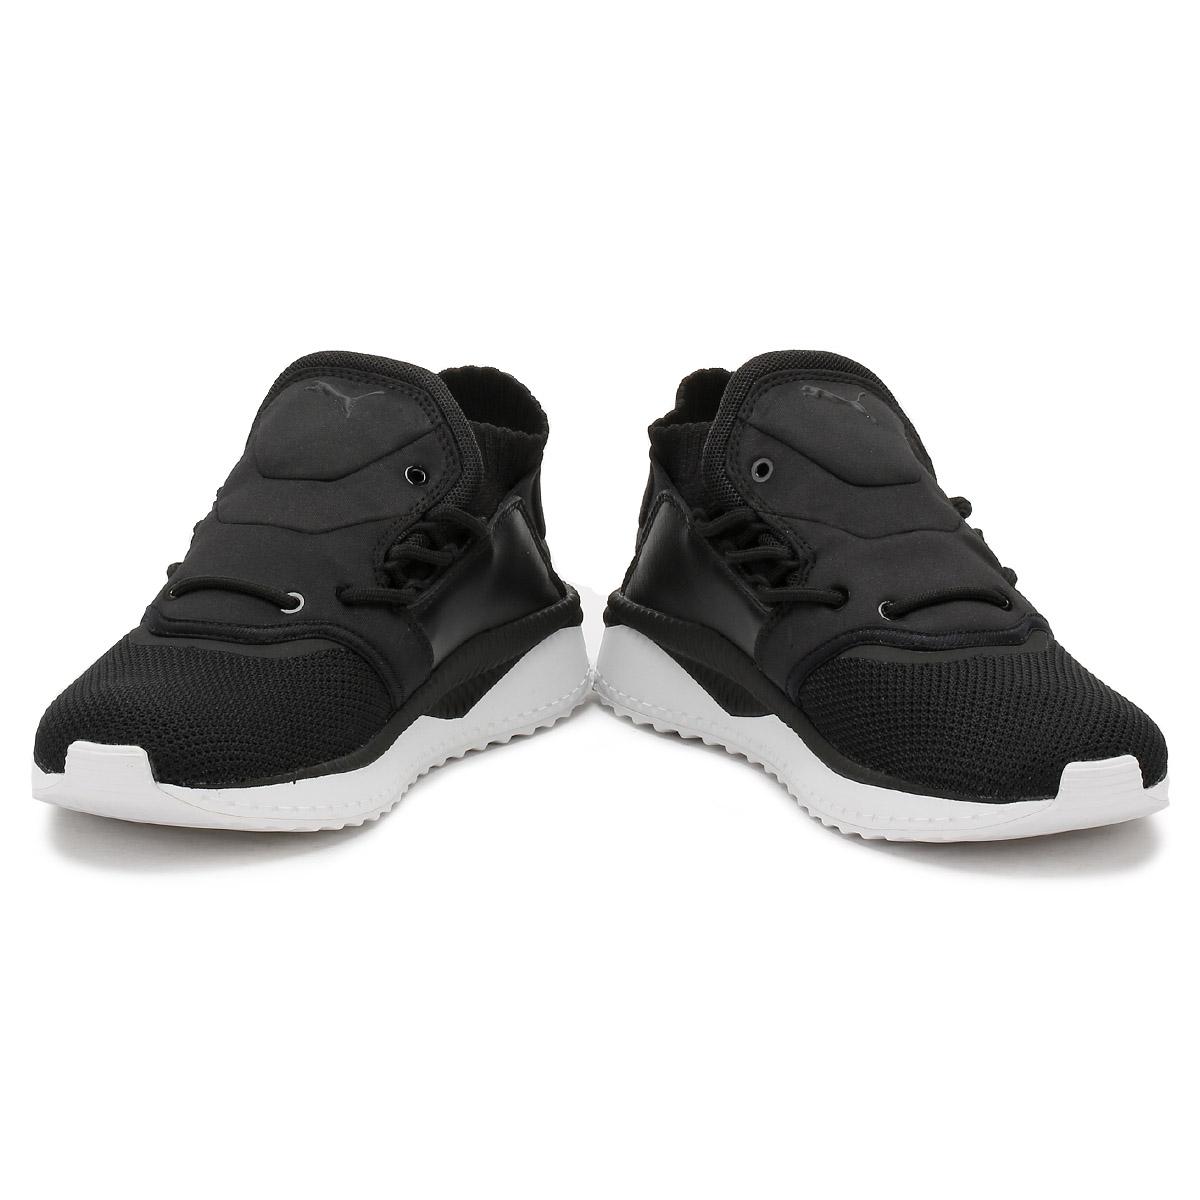 PUMA Mens Textile Black Tsugi Shinsei Trainers Textile Mens Knitted Mesh, Sport Running Shoes 6023bb